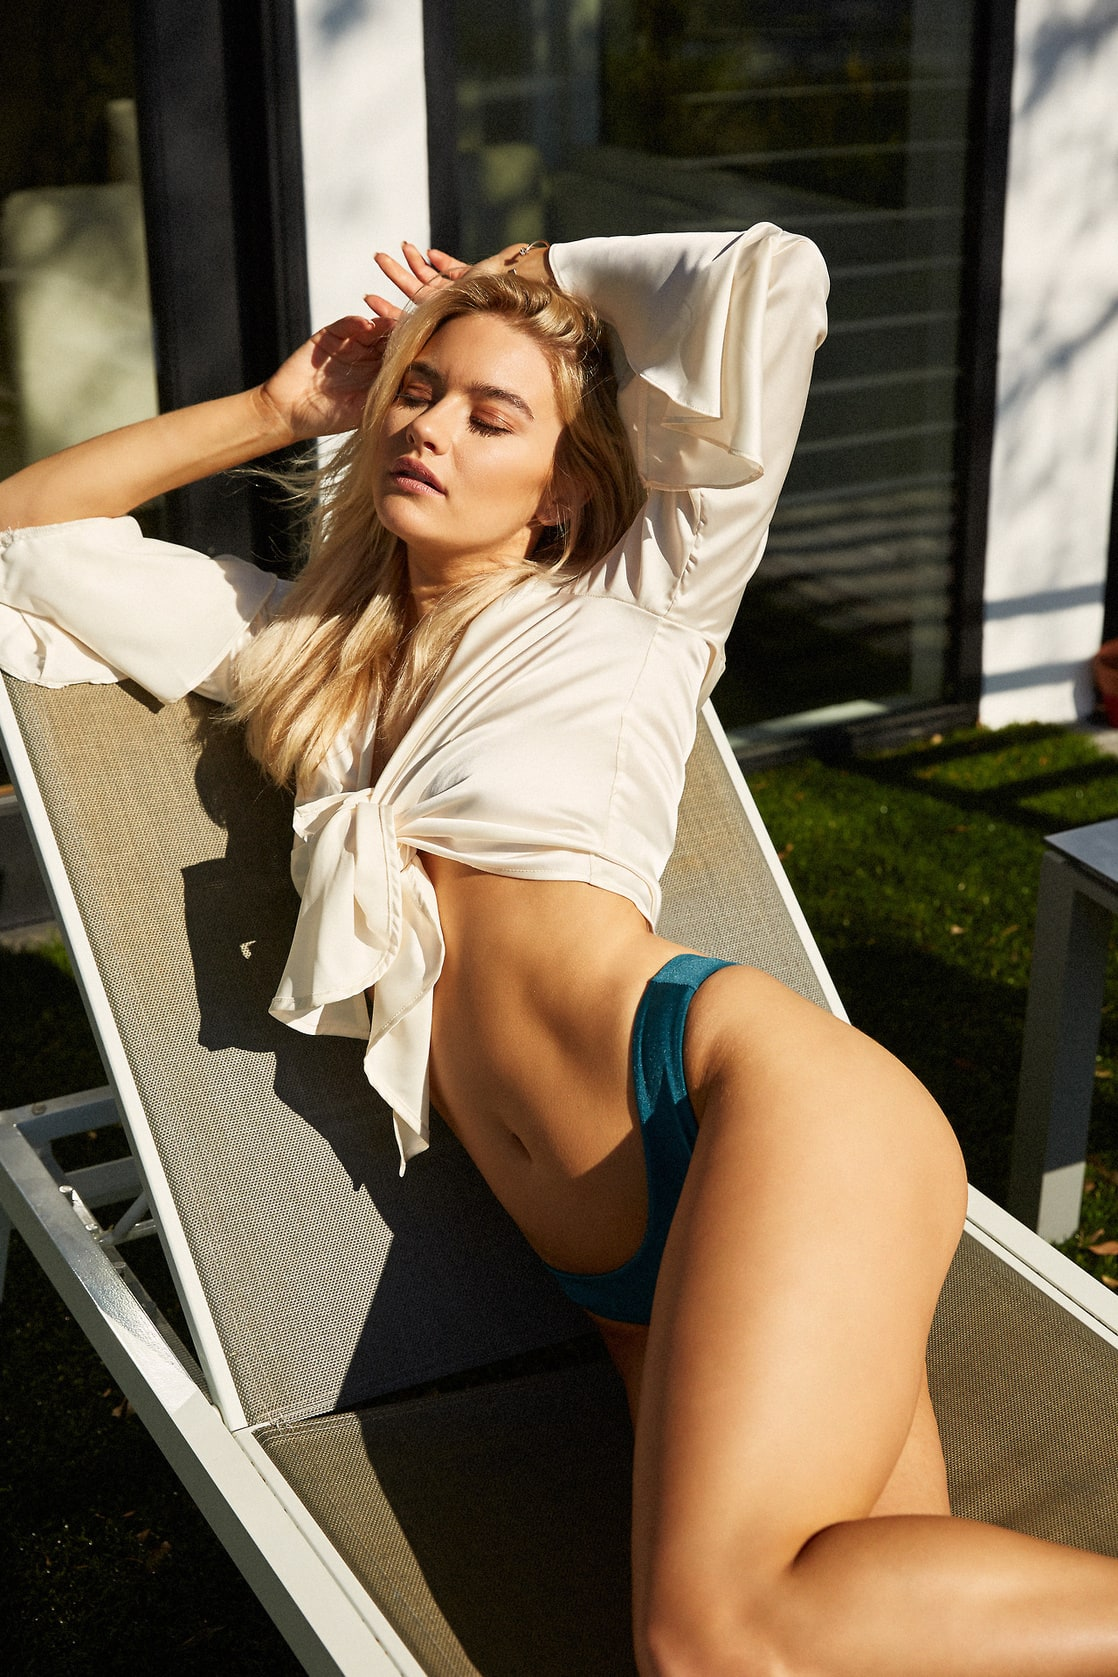 Selfie Tess Jantschek nude photos 2019